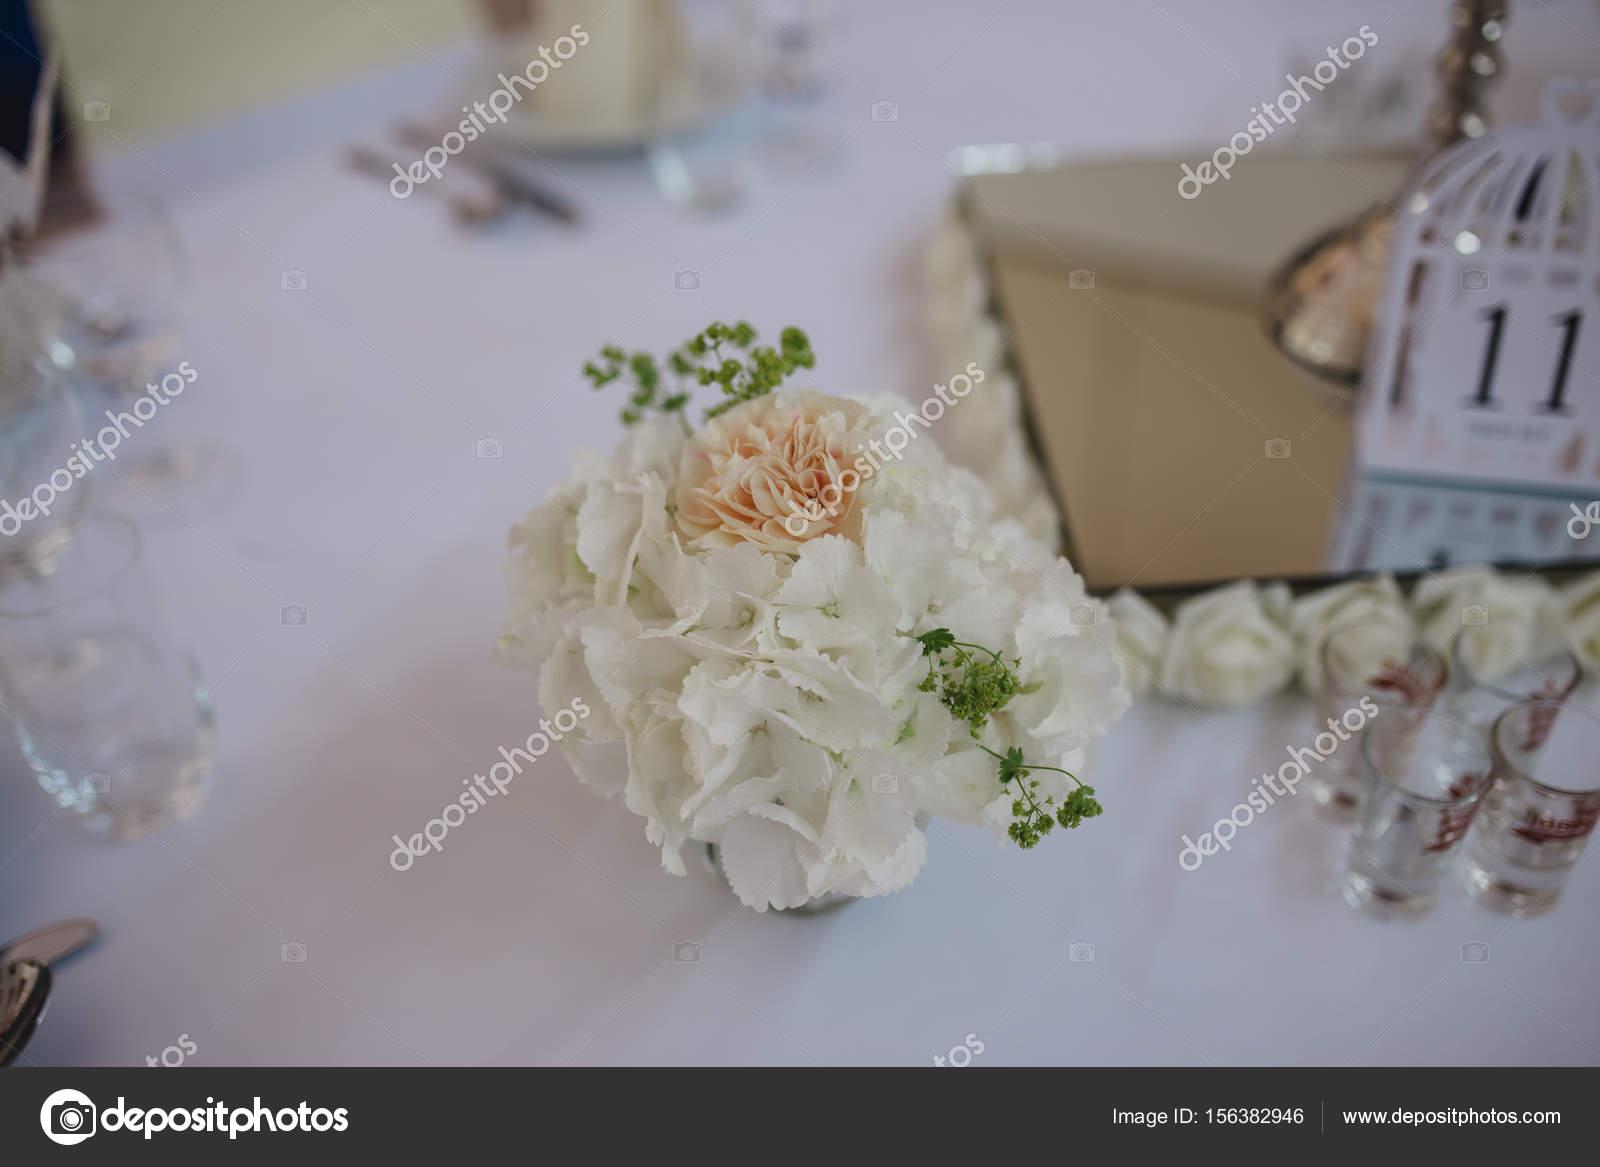 Hochzeit Dekoration Blumen Wand Stockfoto C Lelik83 156382946